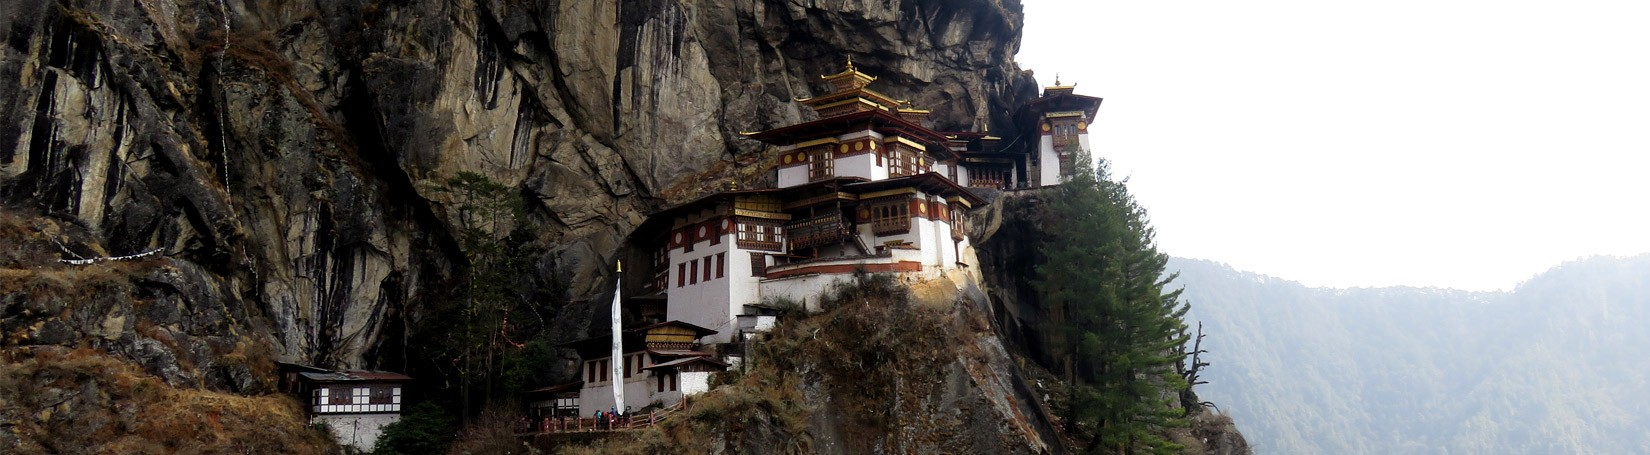 Taktsang Palphug Monastery - Tiger Nest